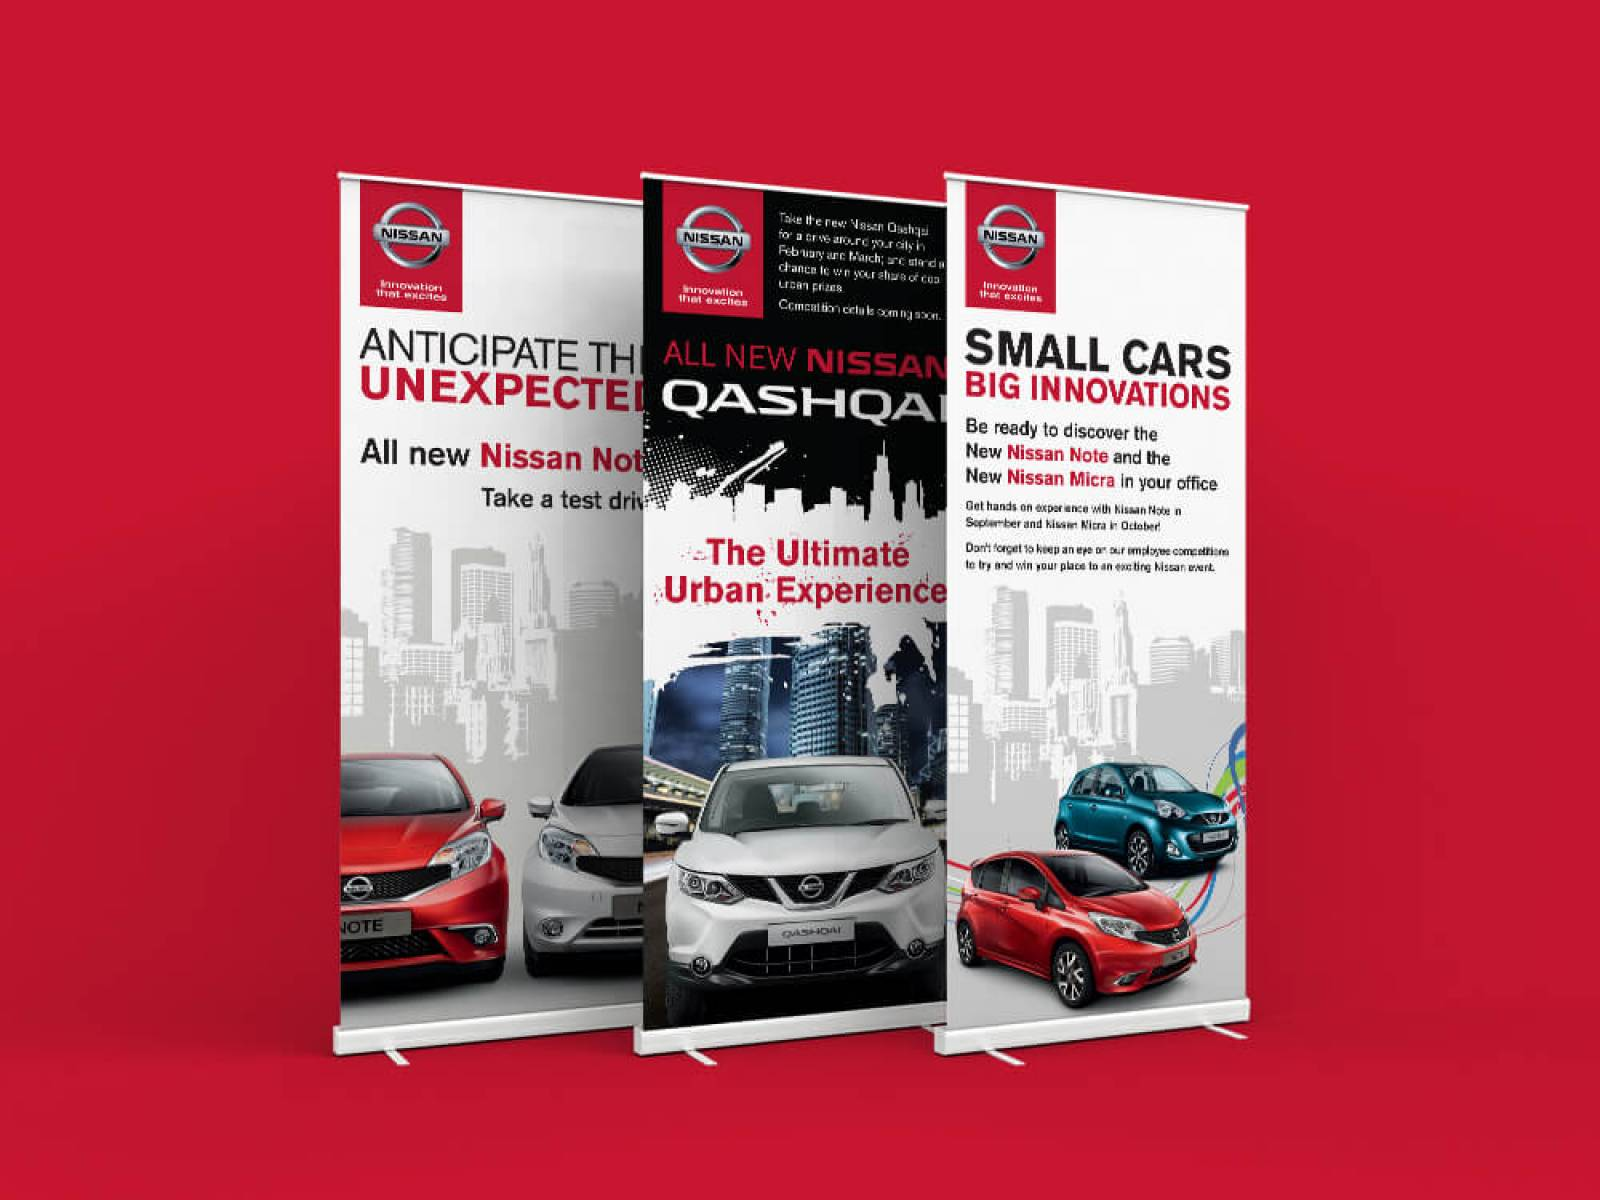 Exhibition-Nissan-banner-2-design-agency-graphic-design-canterbury.jpg